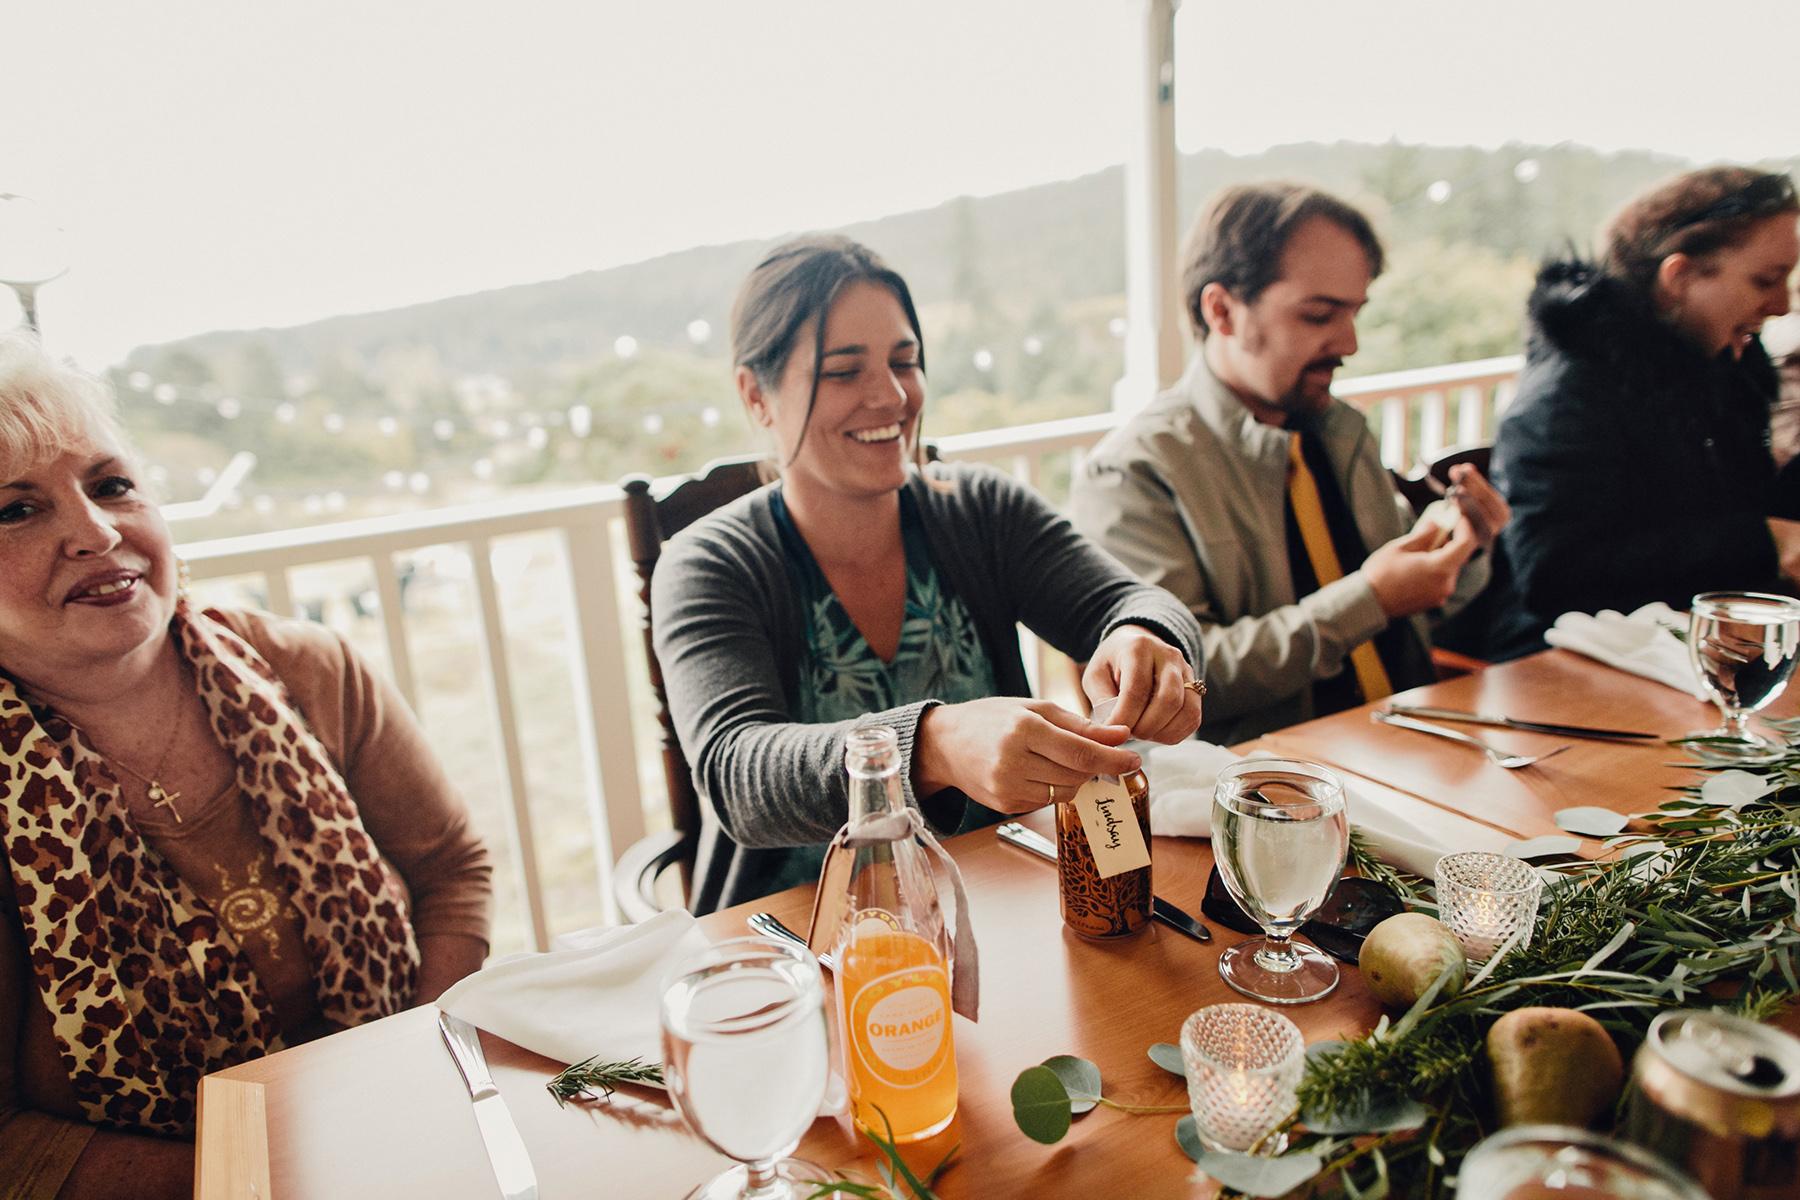 chelsea-brian-wedding-photos-0011.jpg